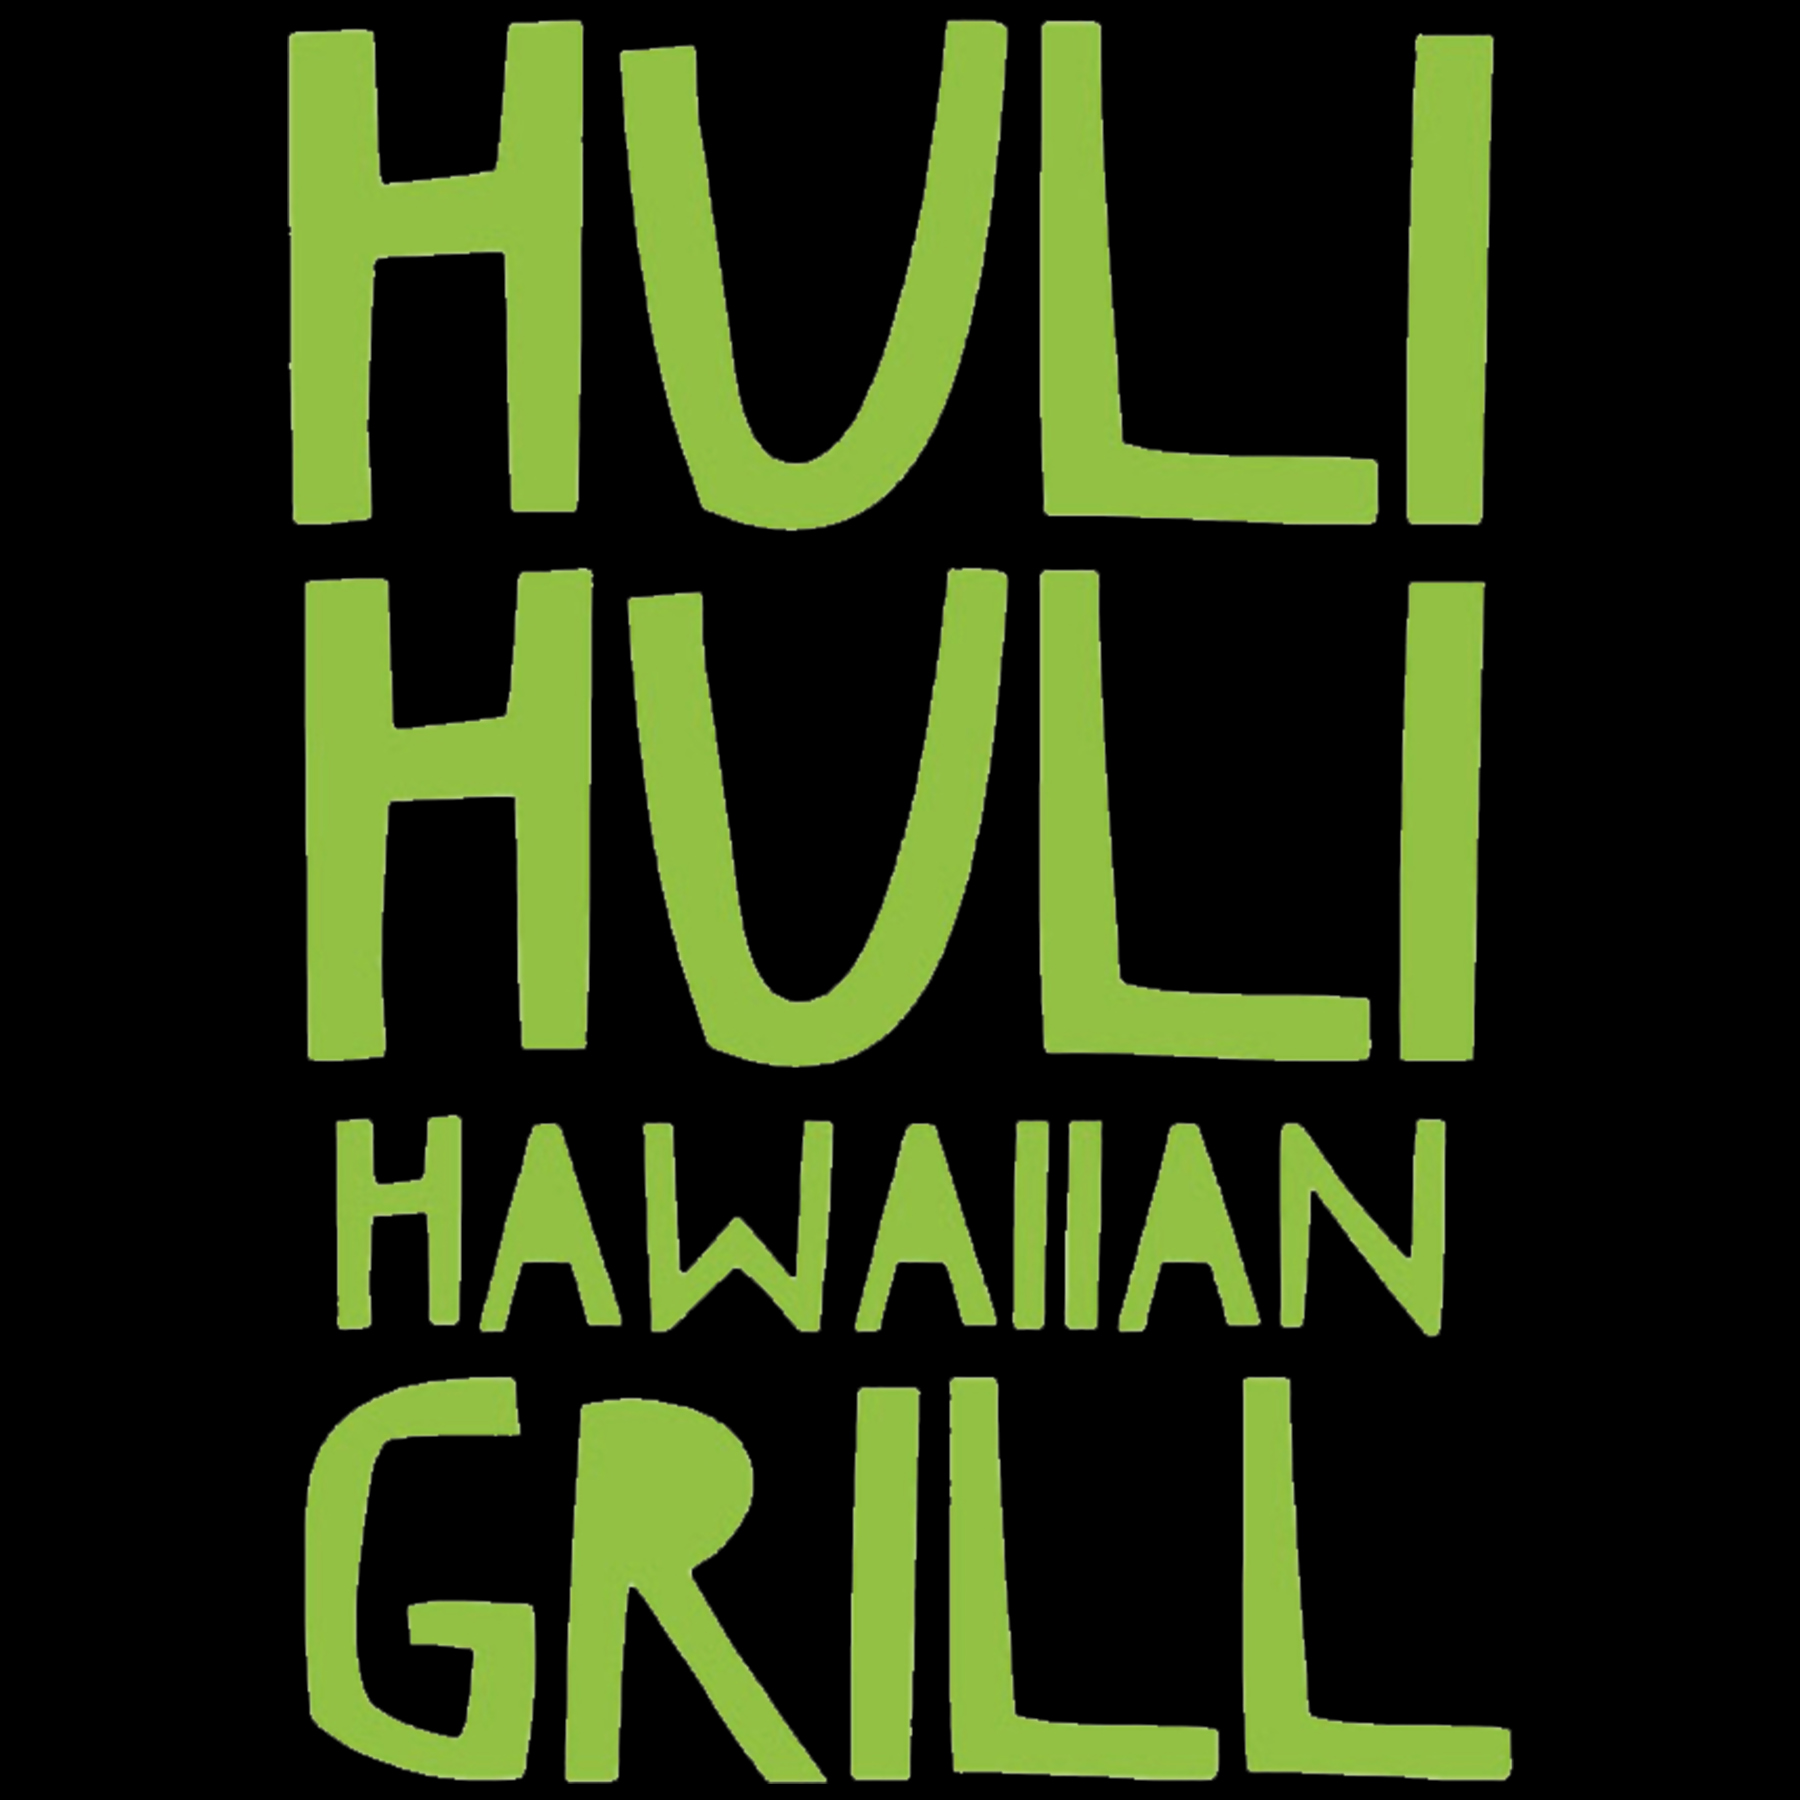 Sunday Gather – Formerly Huli Huli Hawaiian Grill